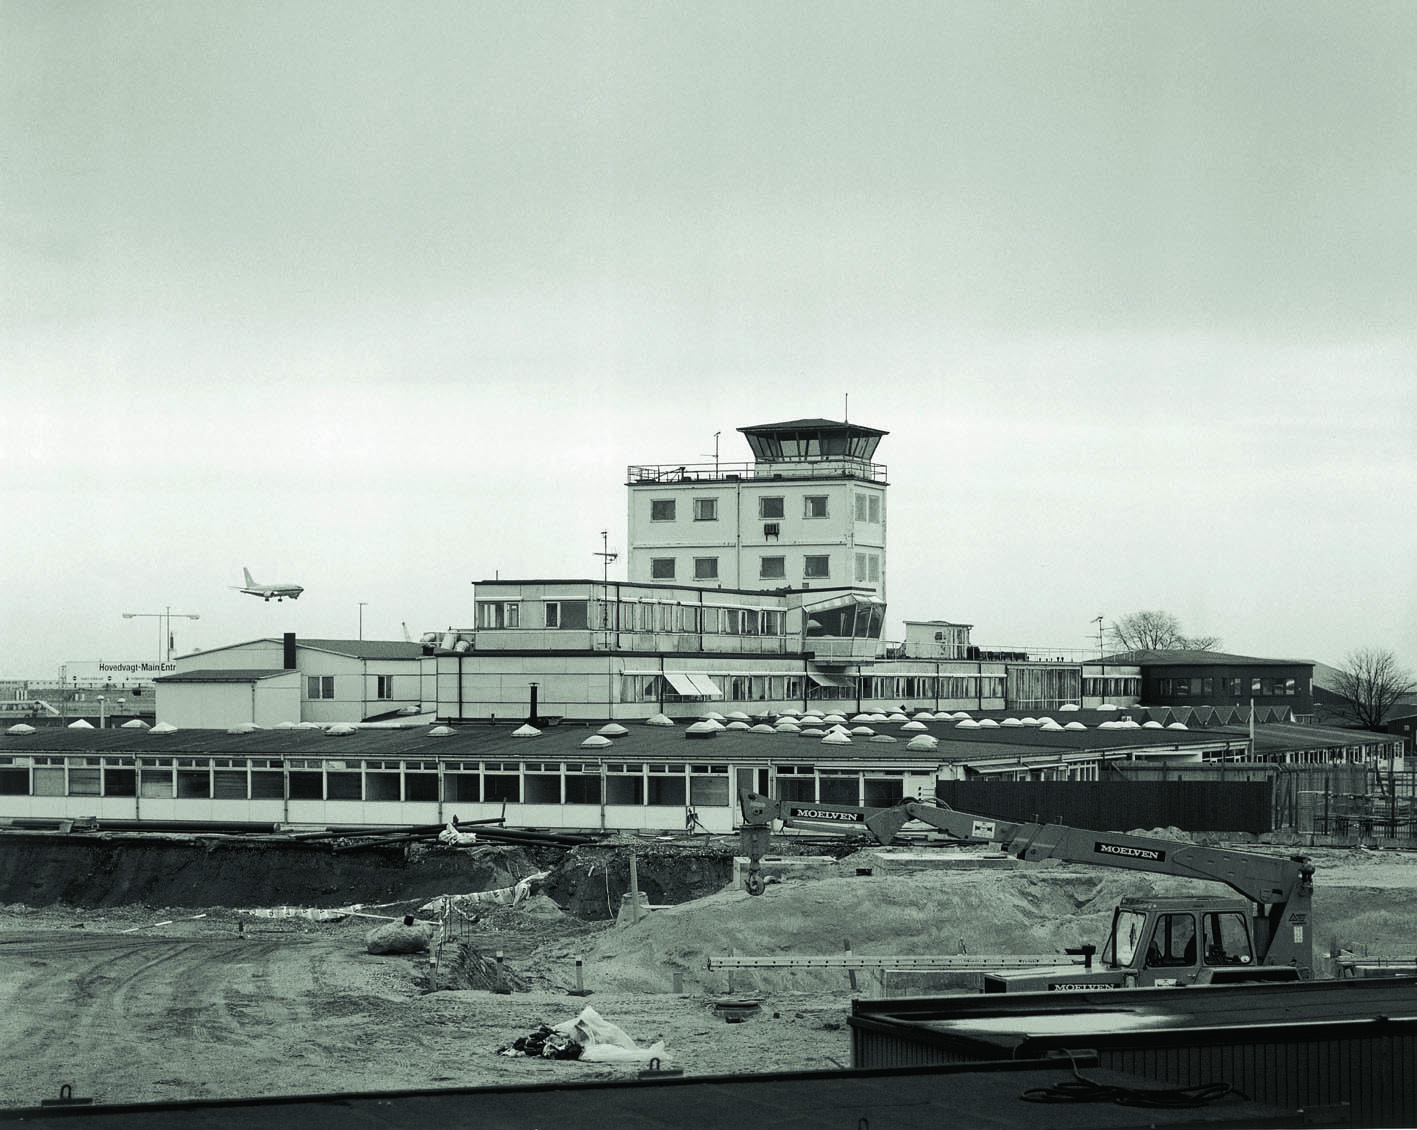 Copenhagen Airport Vilhelm Lauritzen Terminal EU Prize